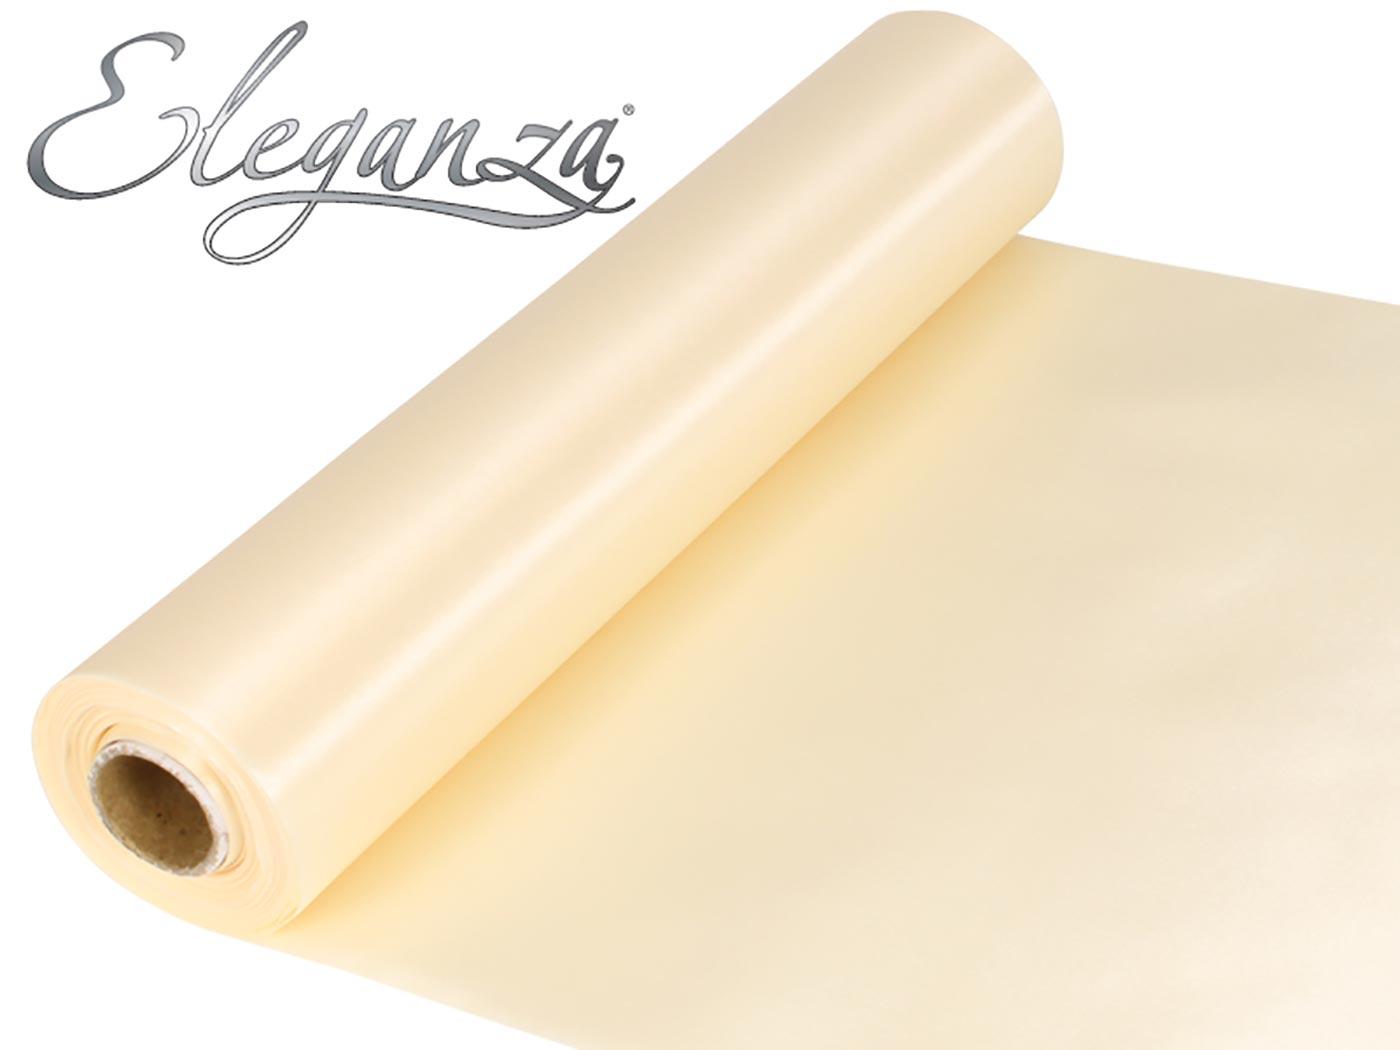 Eleganza Satin Fabric 29cm x 20m Champagne Gold